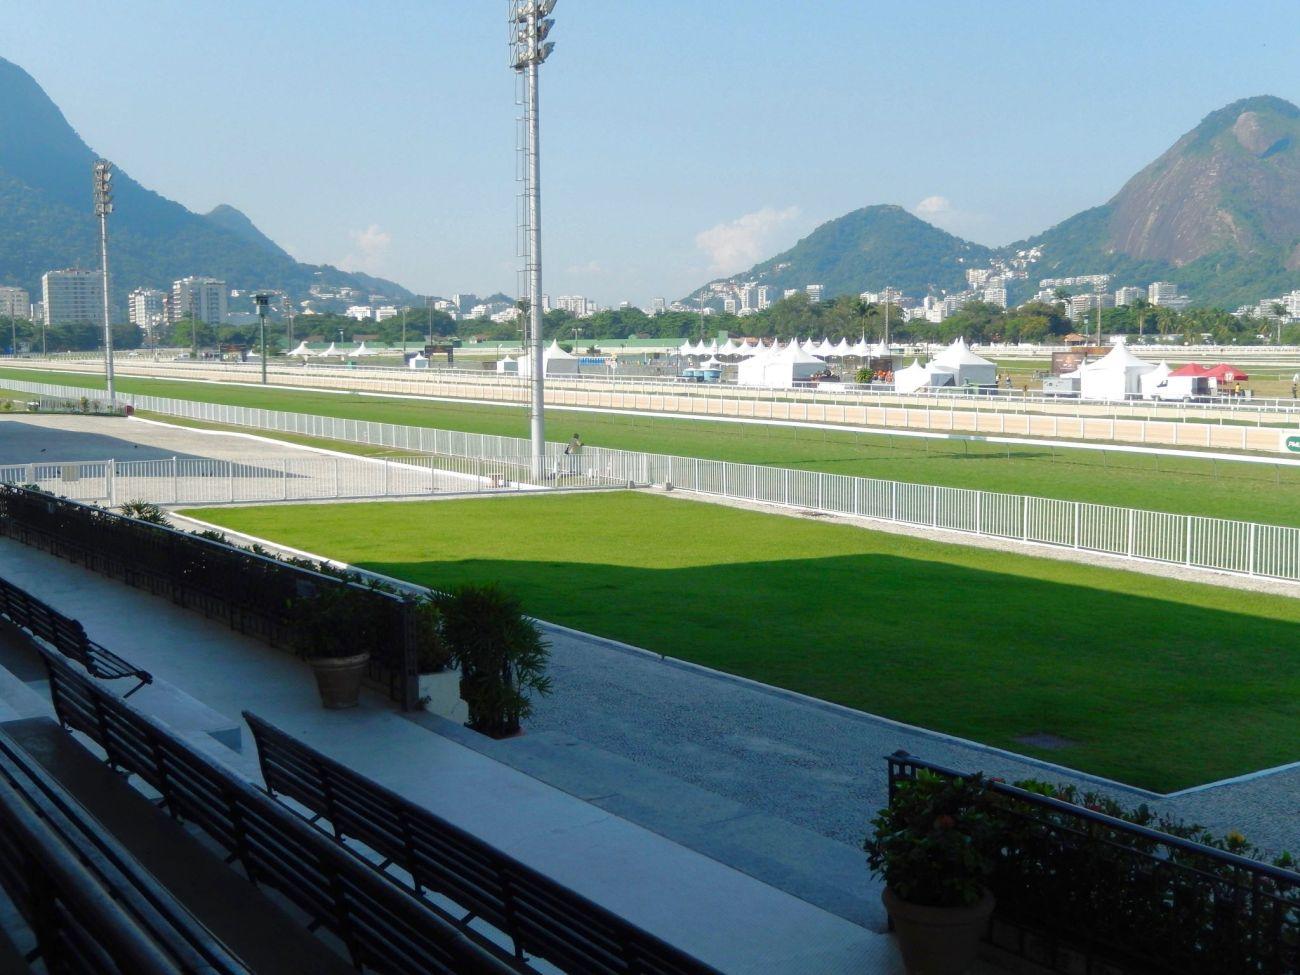 A Lazy Sunday at the Jockey Club Rio 3 - Footloose Lemon Juice